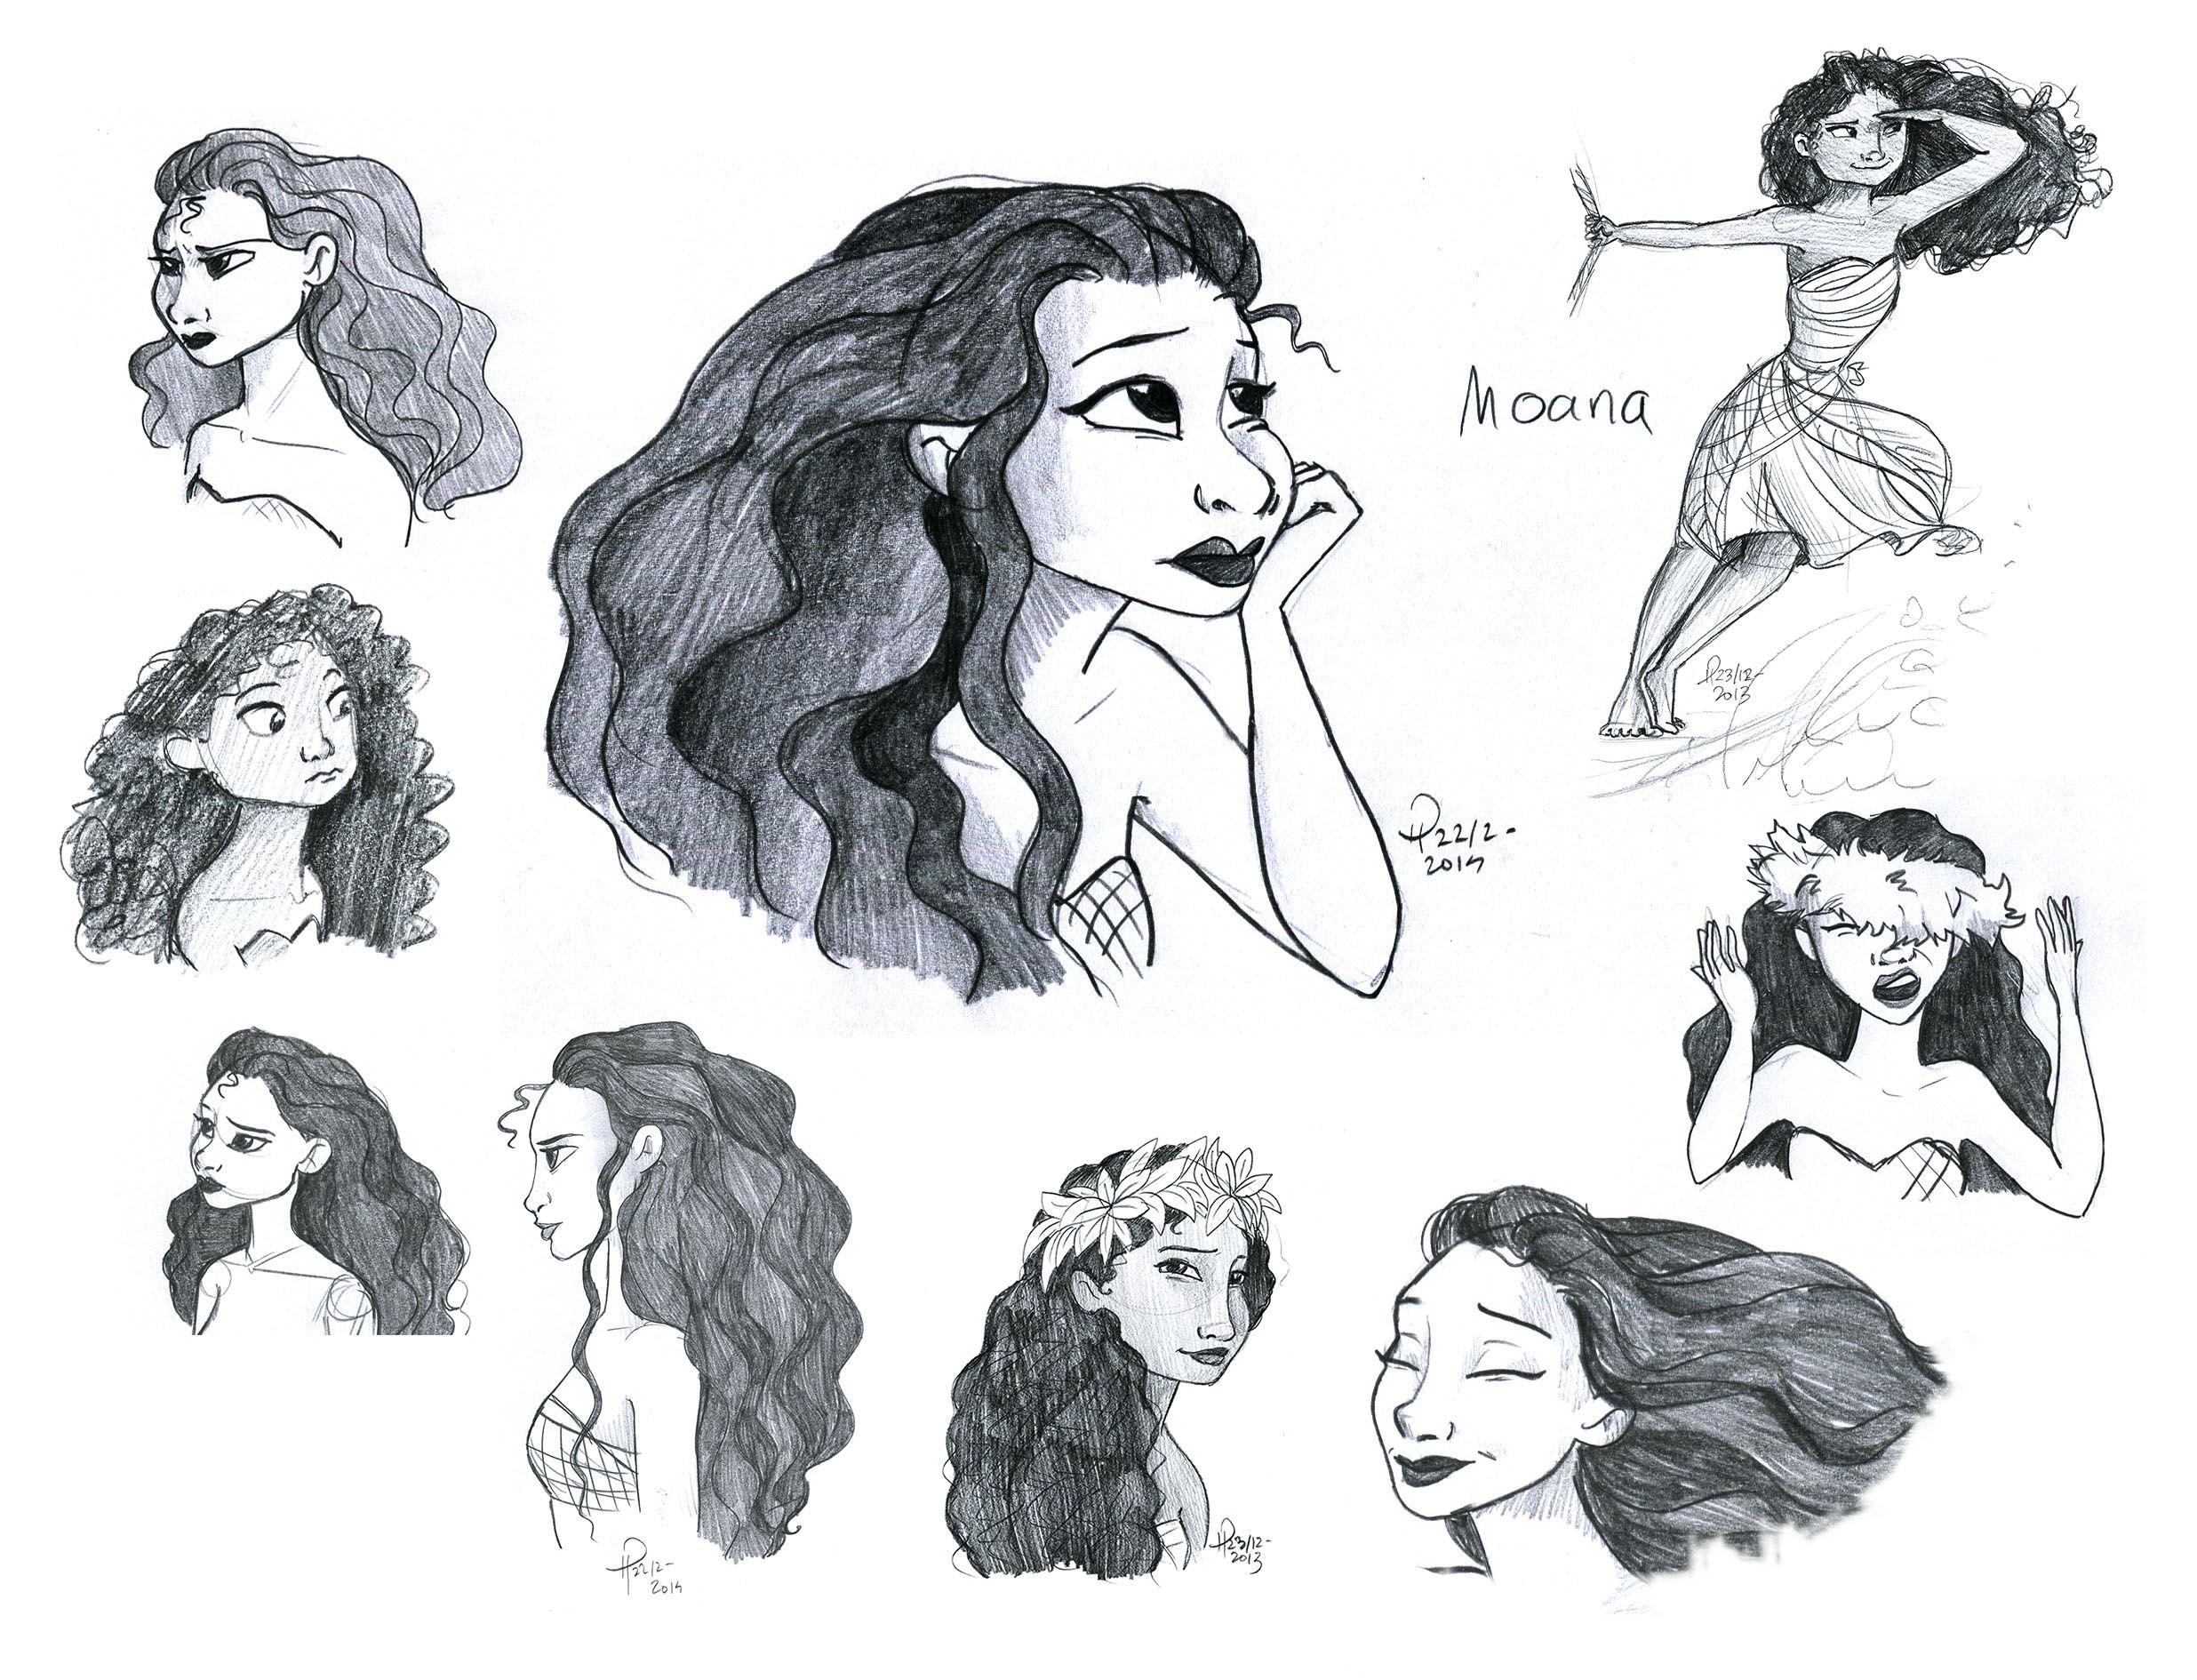 Moana Disney Character Design : Moana character concept art pinterest